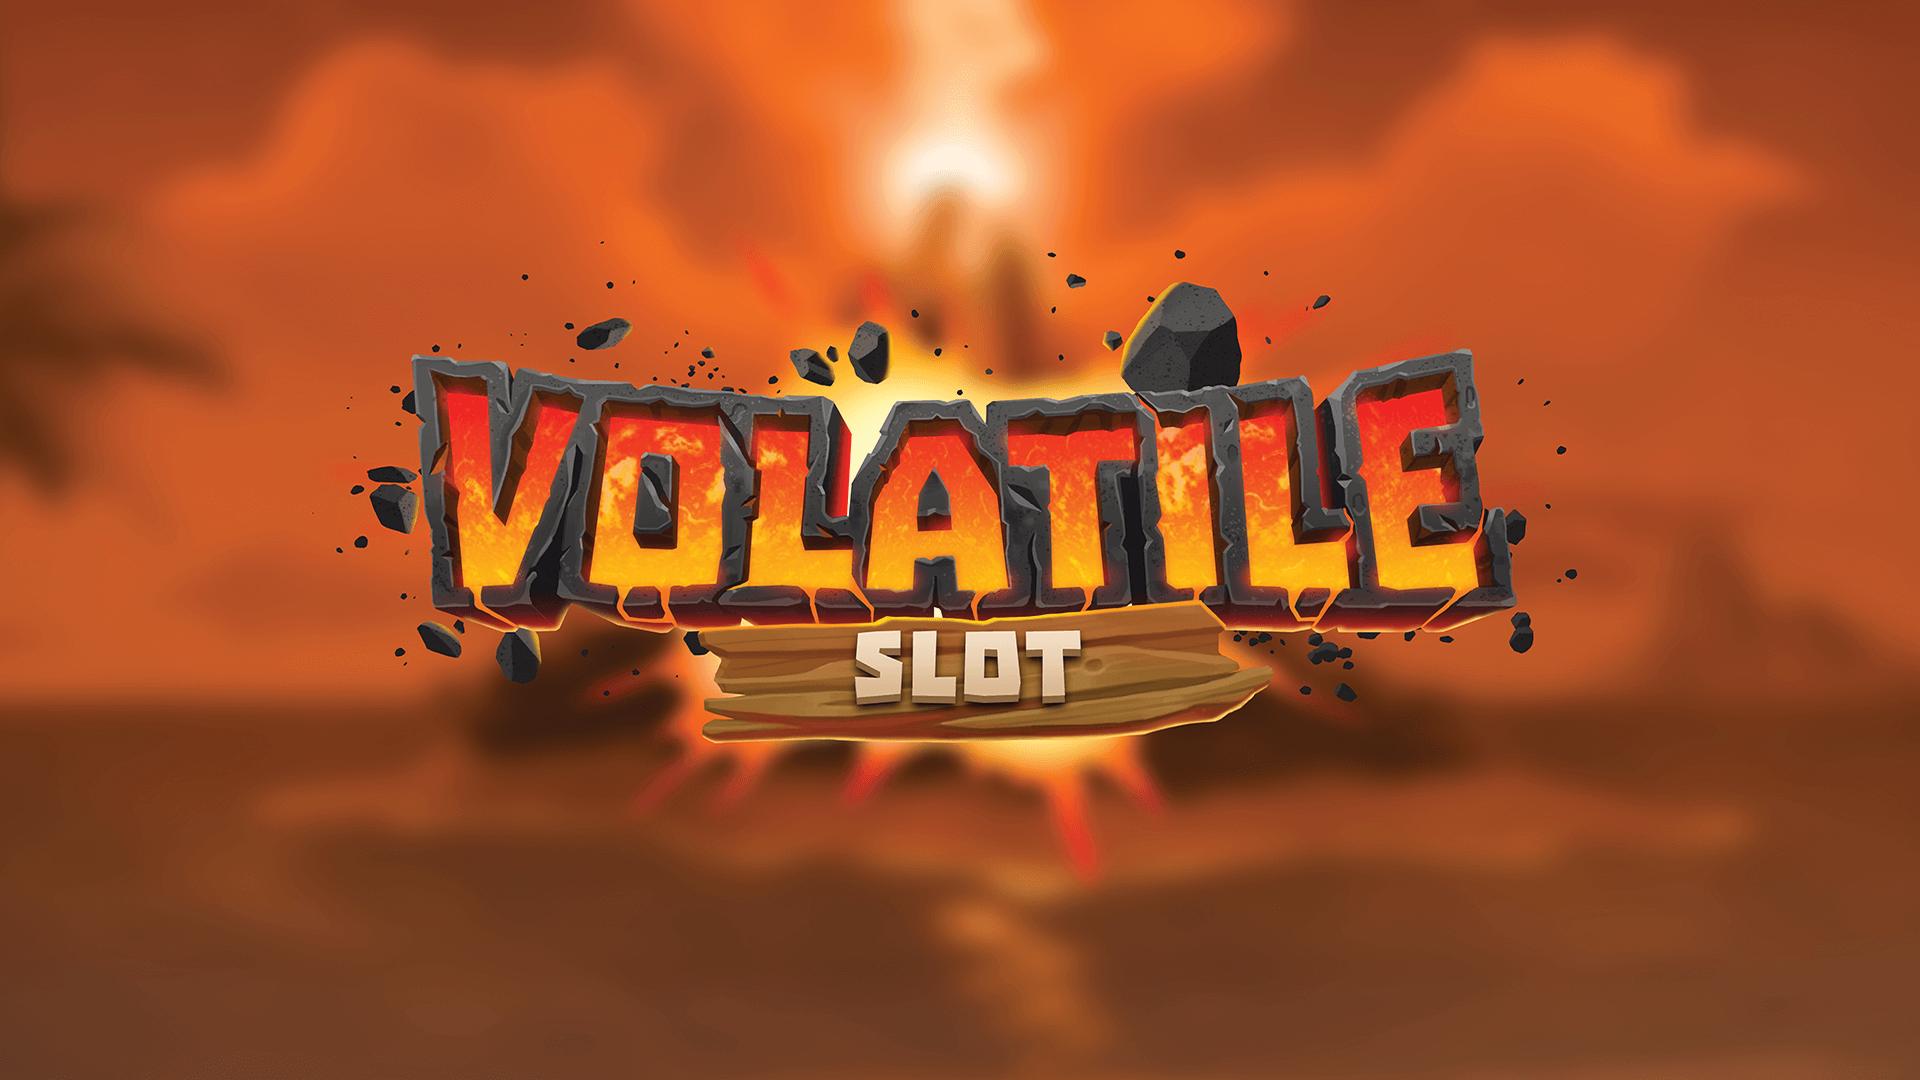 Volatile Slot image